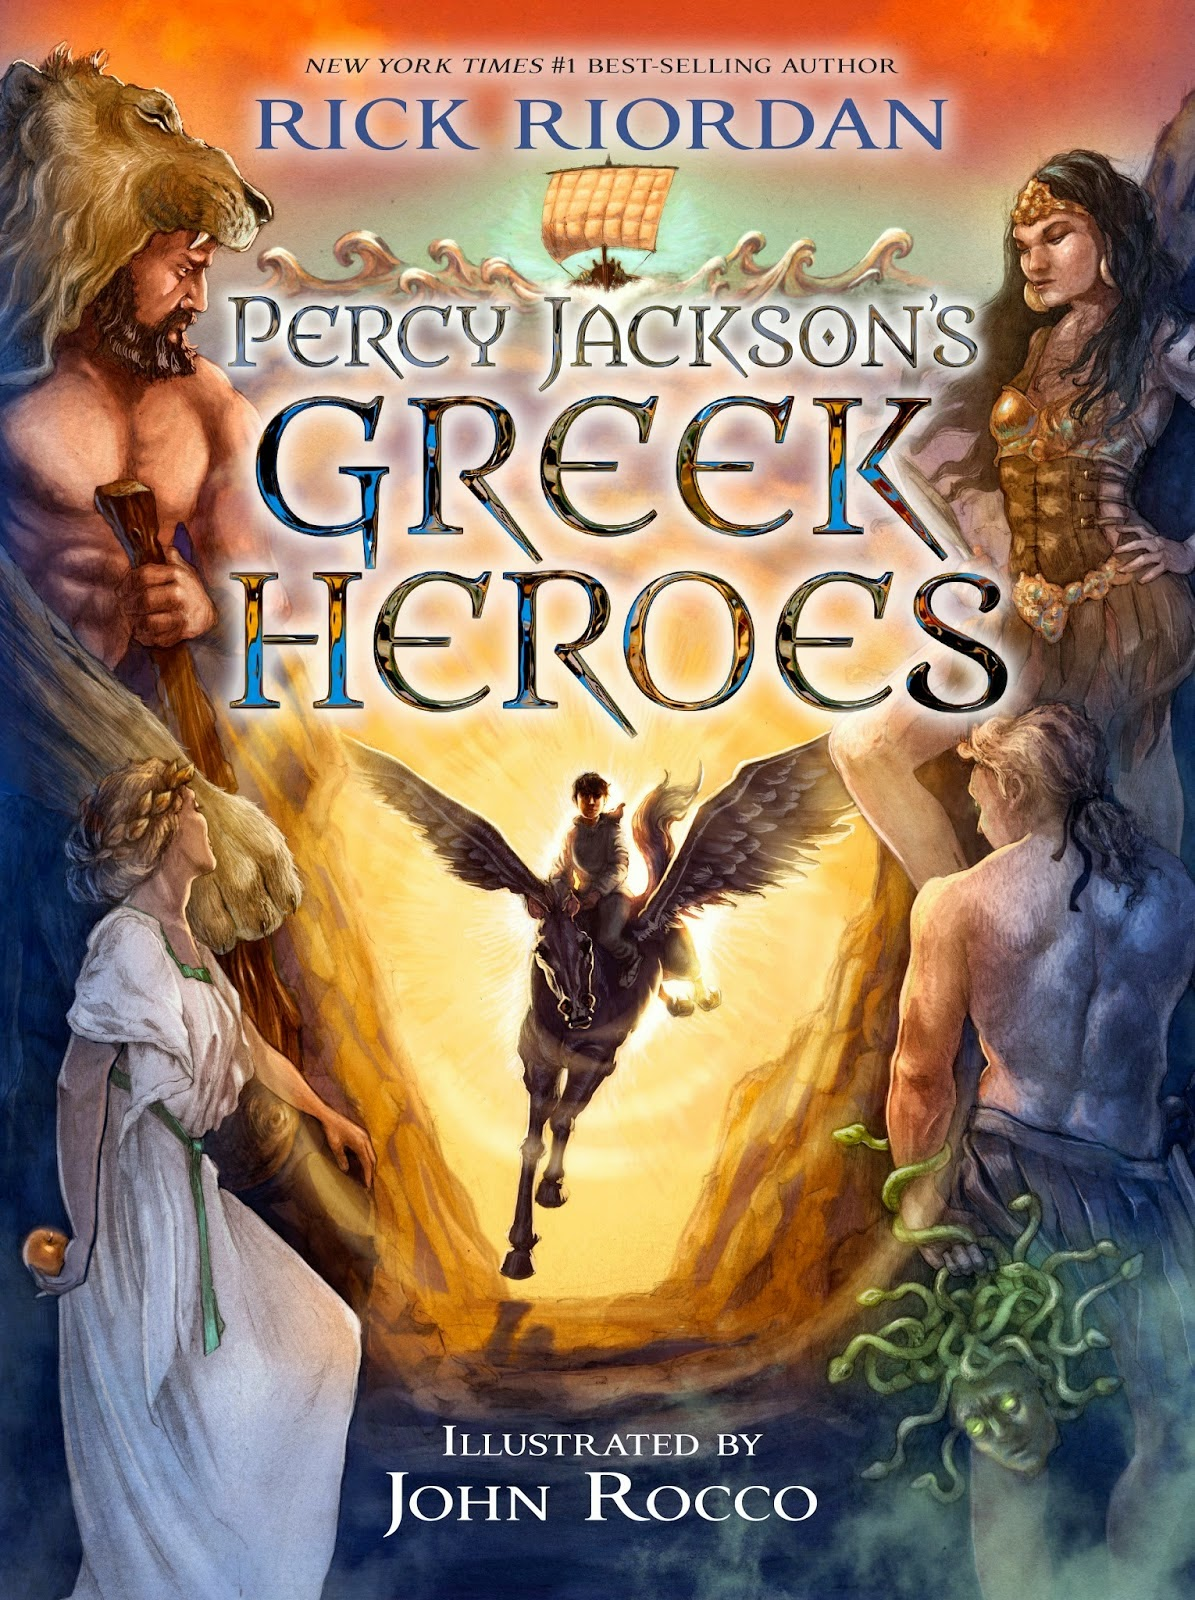 Percy Jackson's Greek Heroes by Rick Riordan